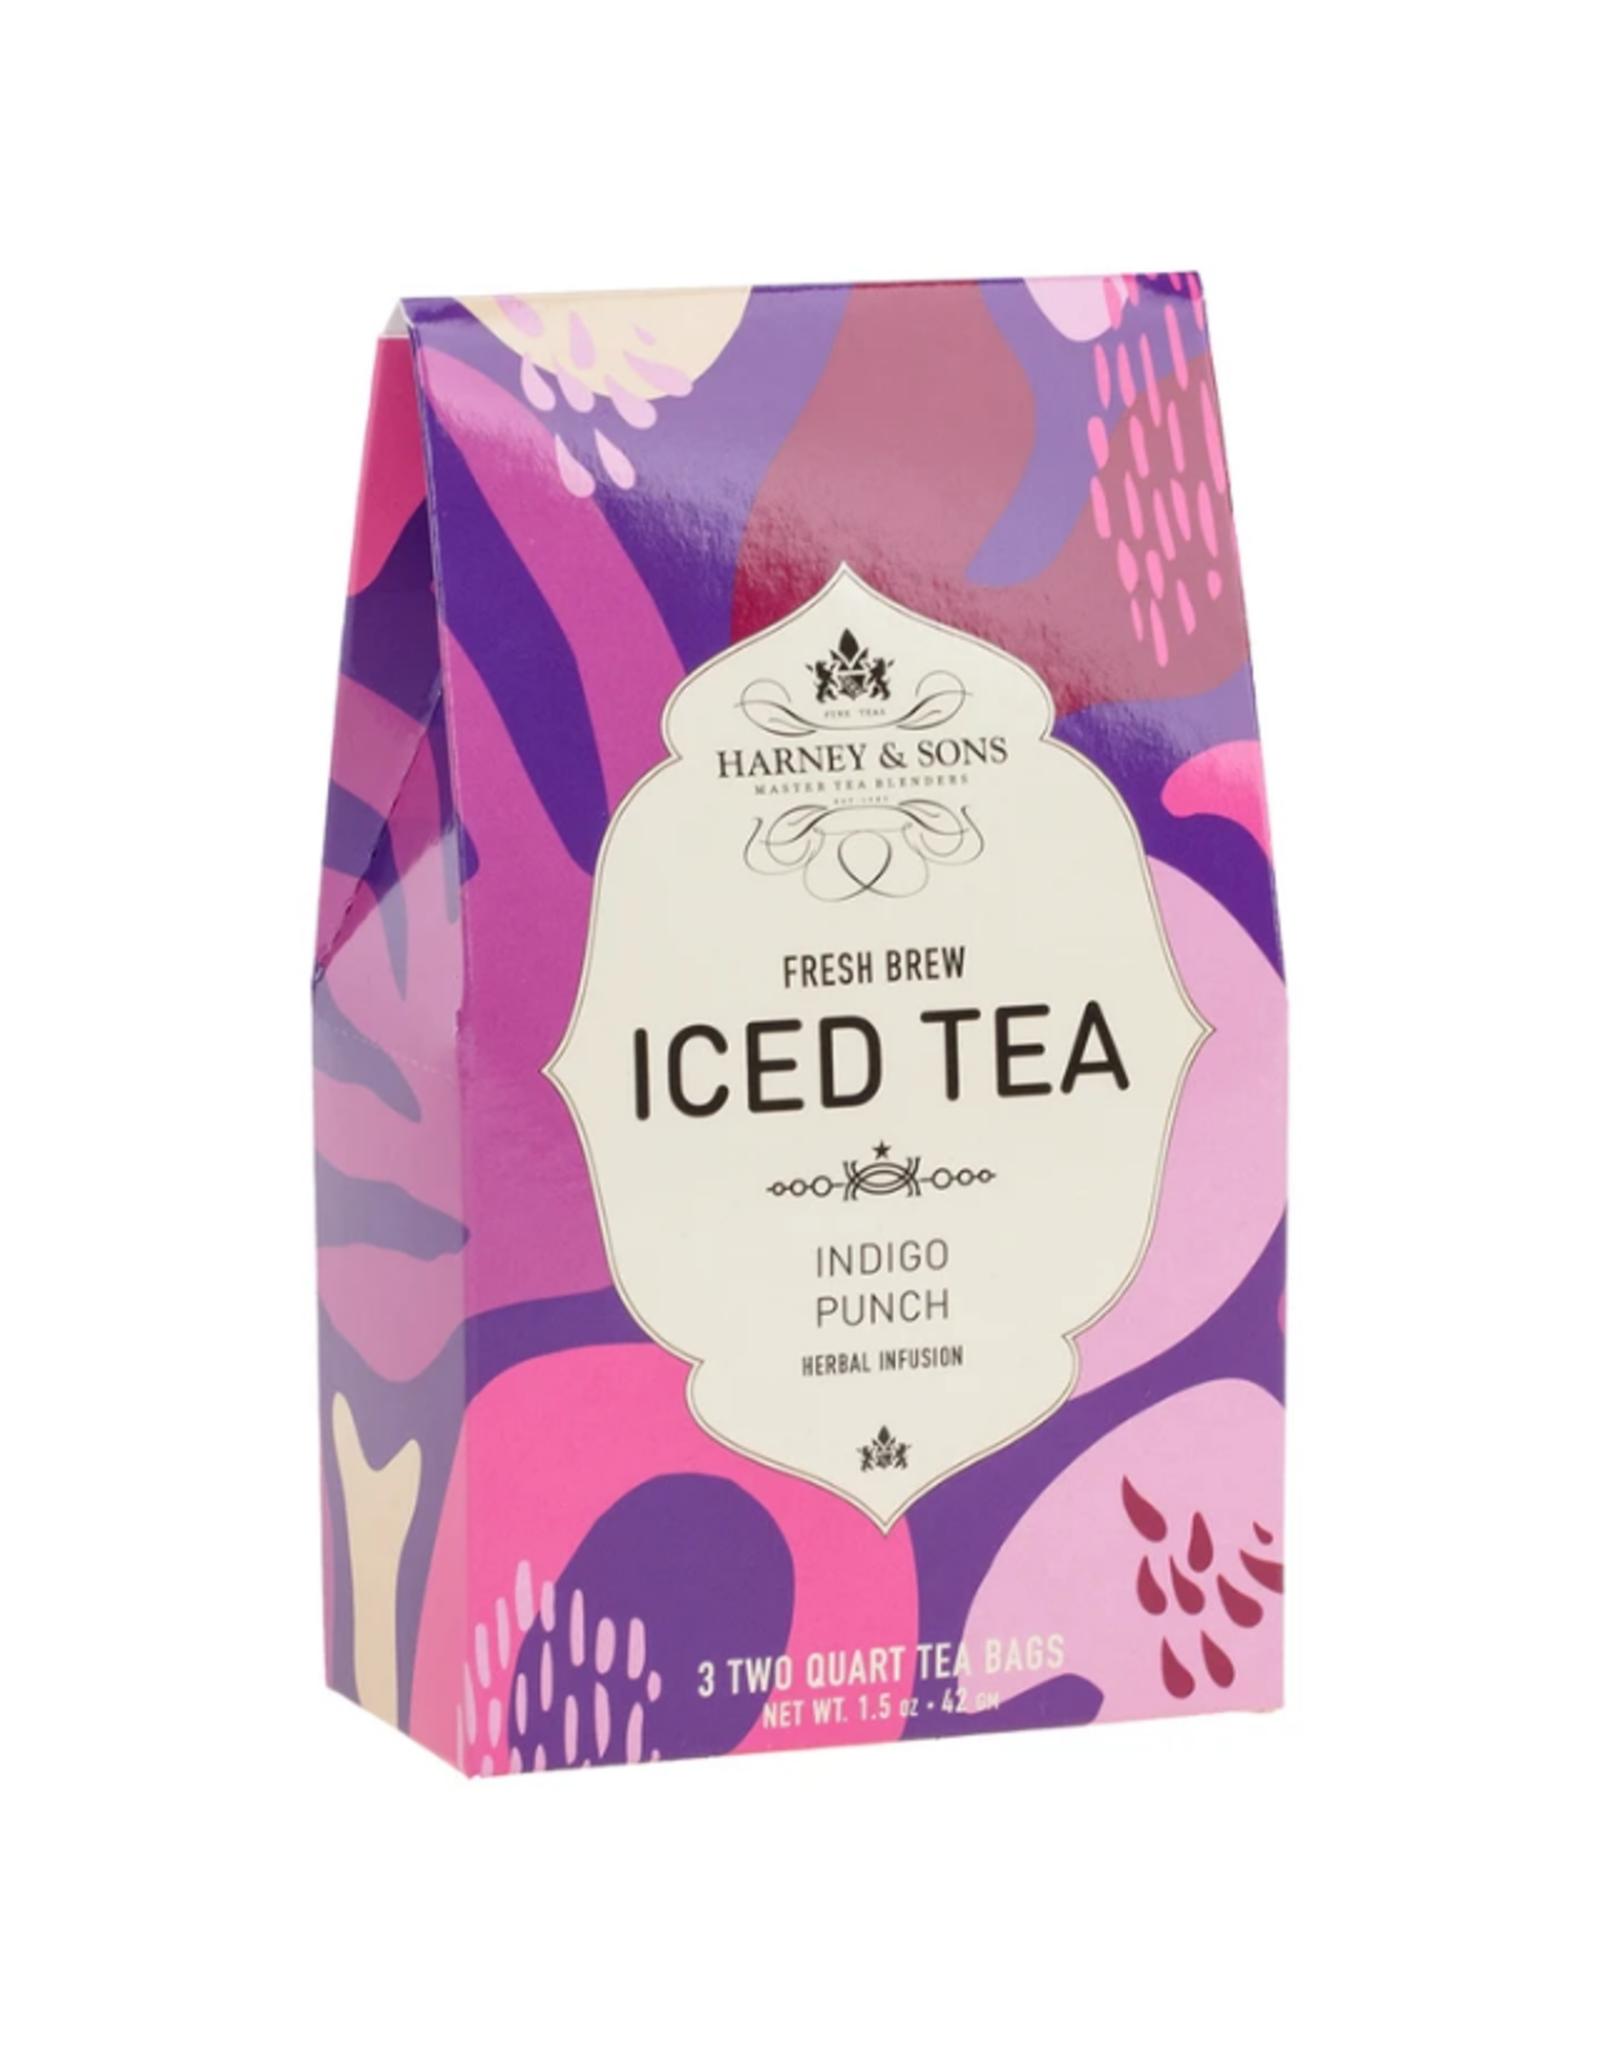 Harney & Sons Iced Tea Indigo Punch - 3 2qt Bags